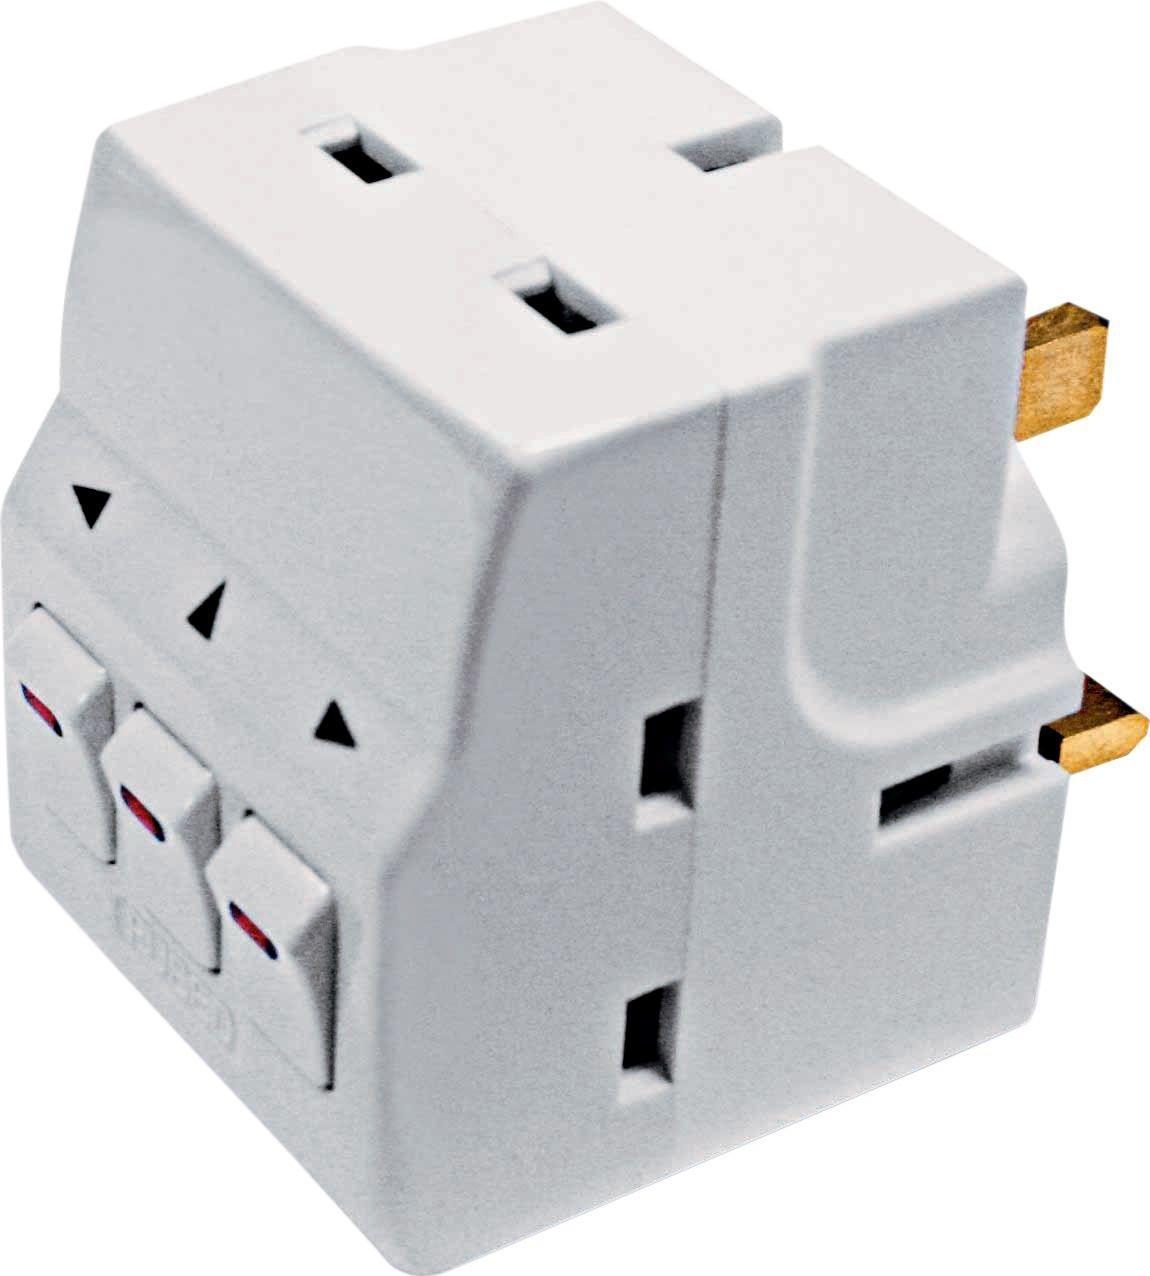 Masterplug - 3-Way Individually Switched Adaptor